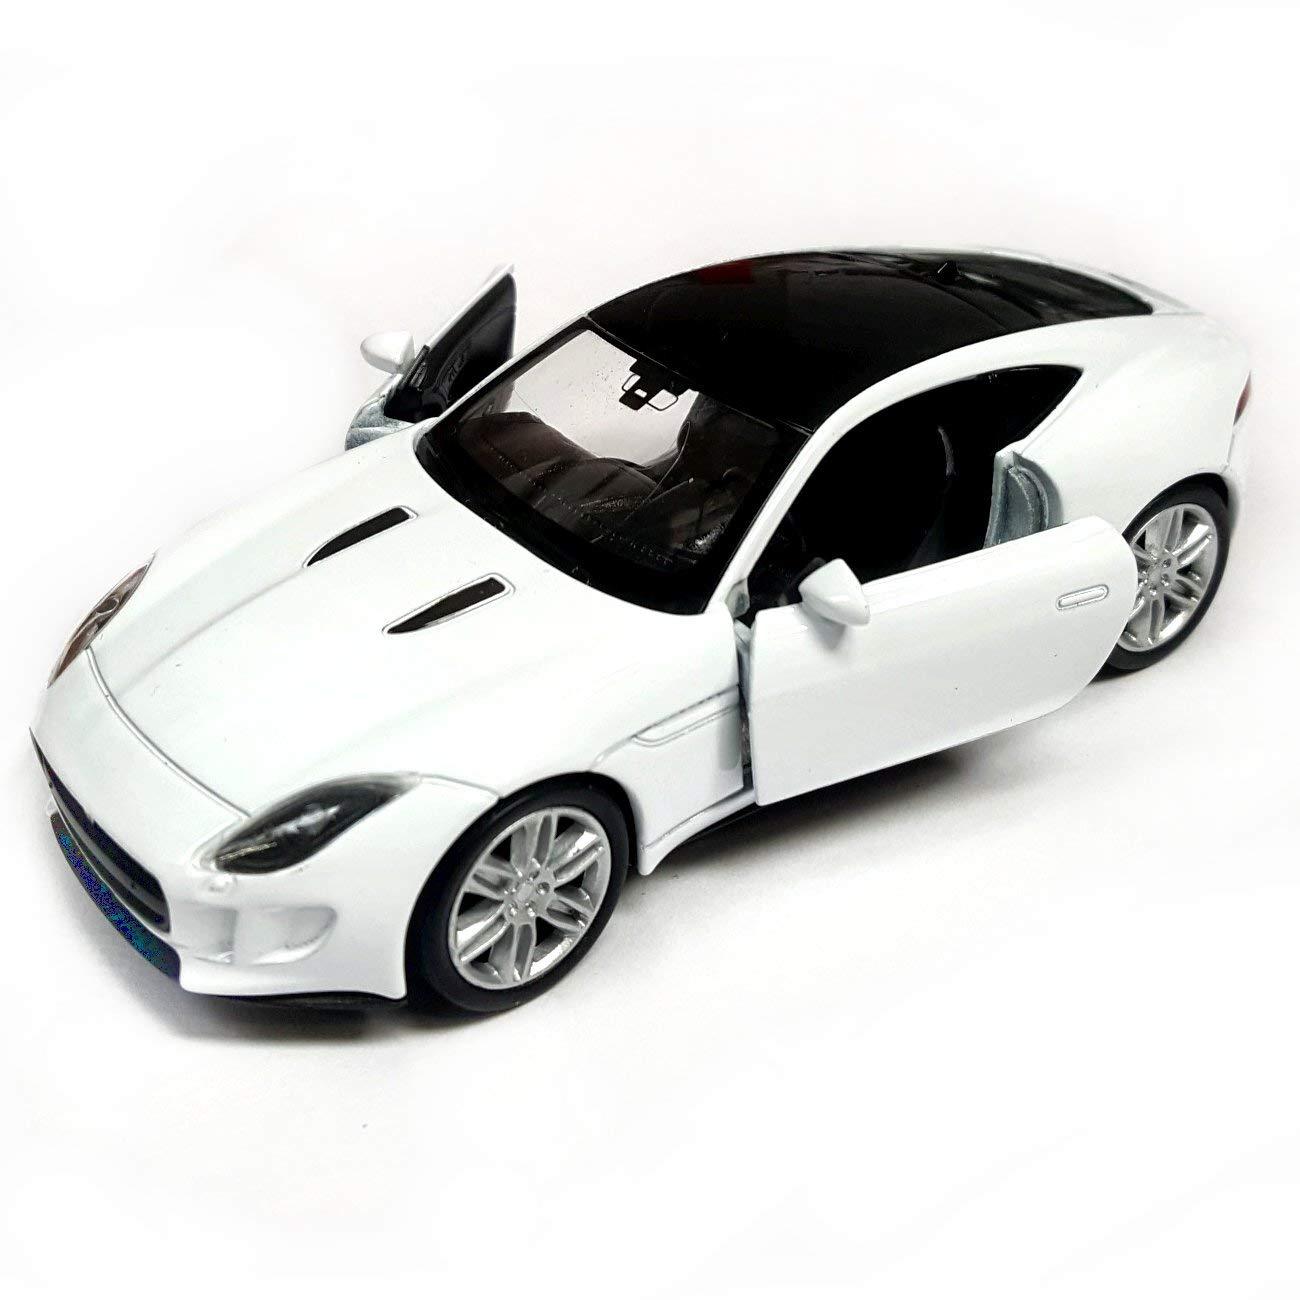 F Type Coupe >> Amazon Com Die Cast White Jaguar F Type Coupe Model Toy Car